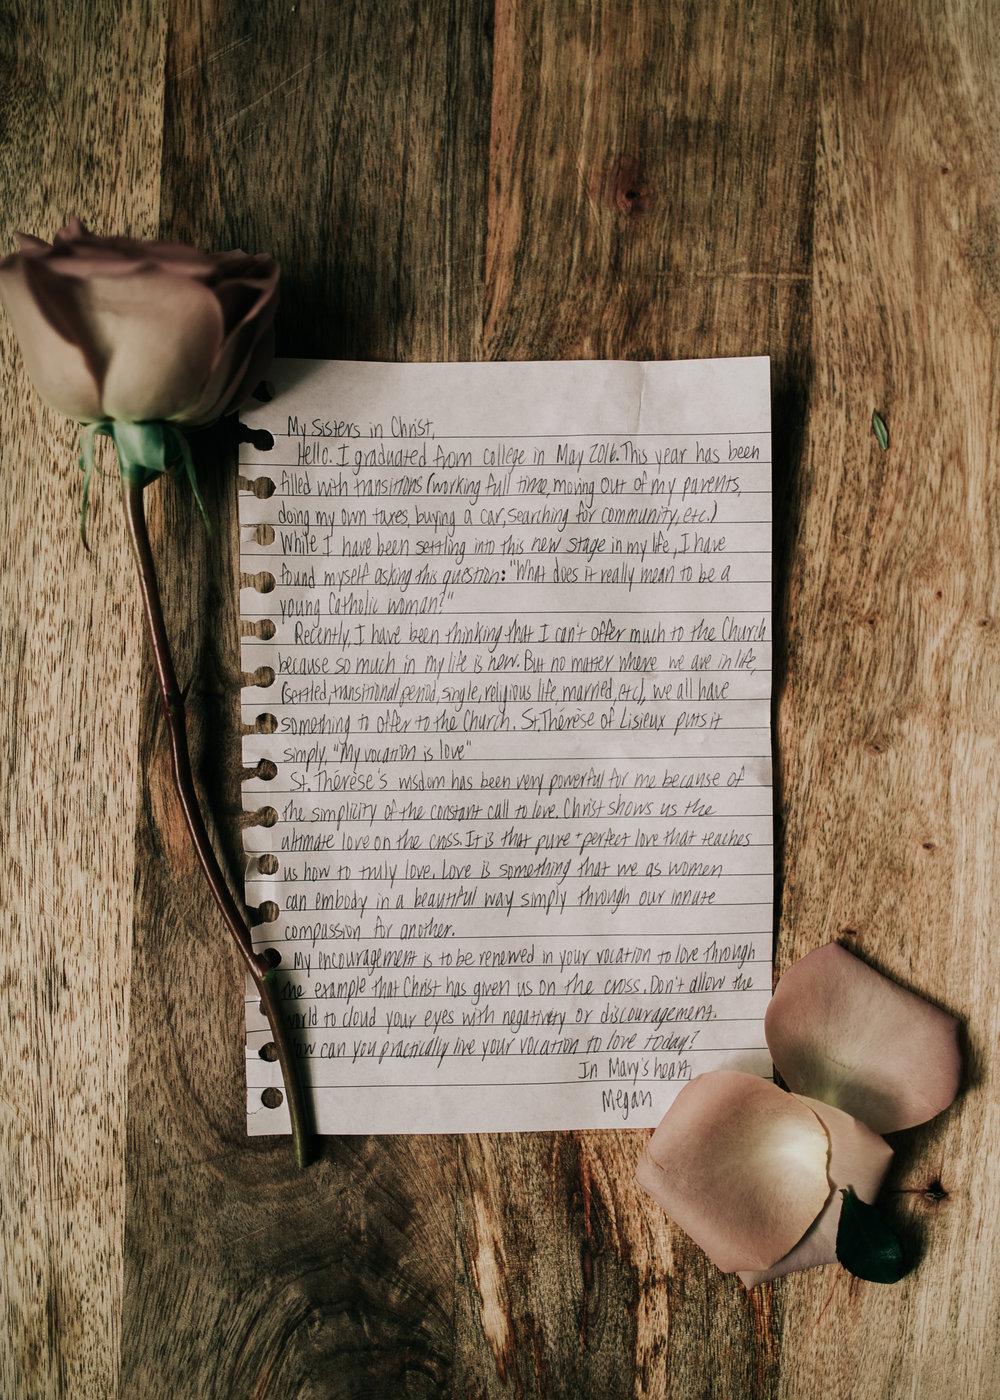 The-Catholic-Woman-Megan-Dickert-Letter-1